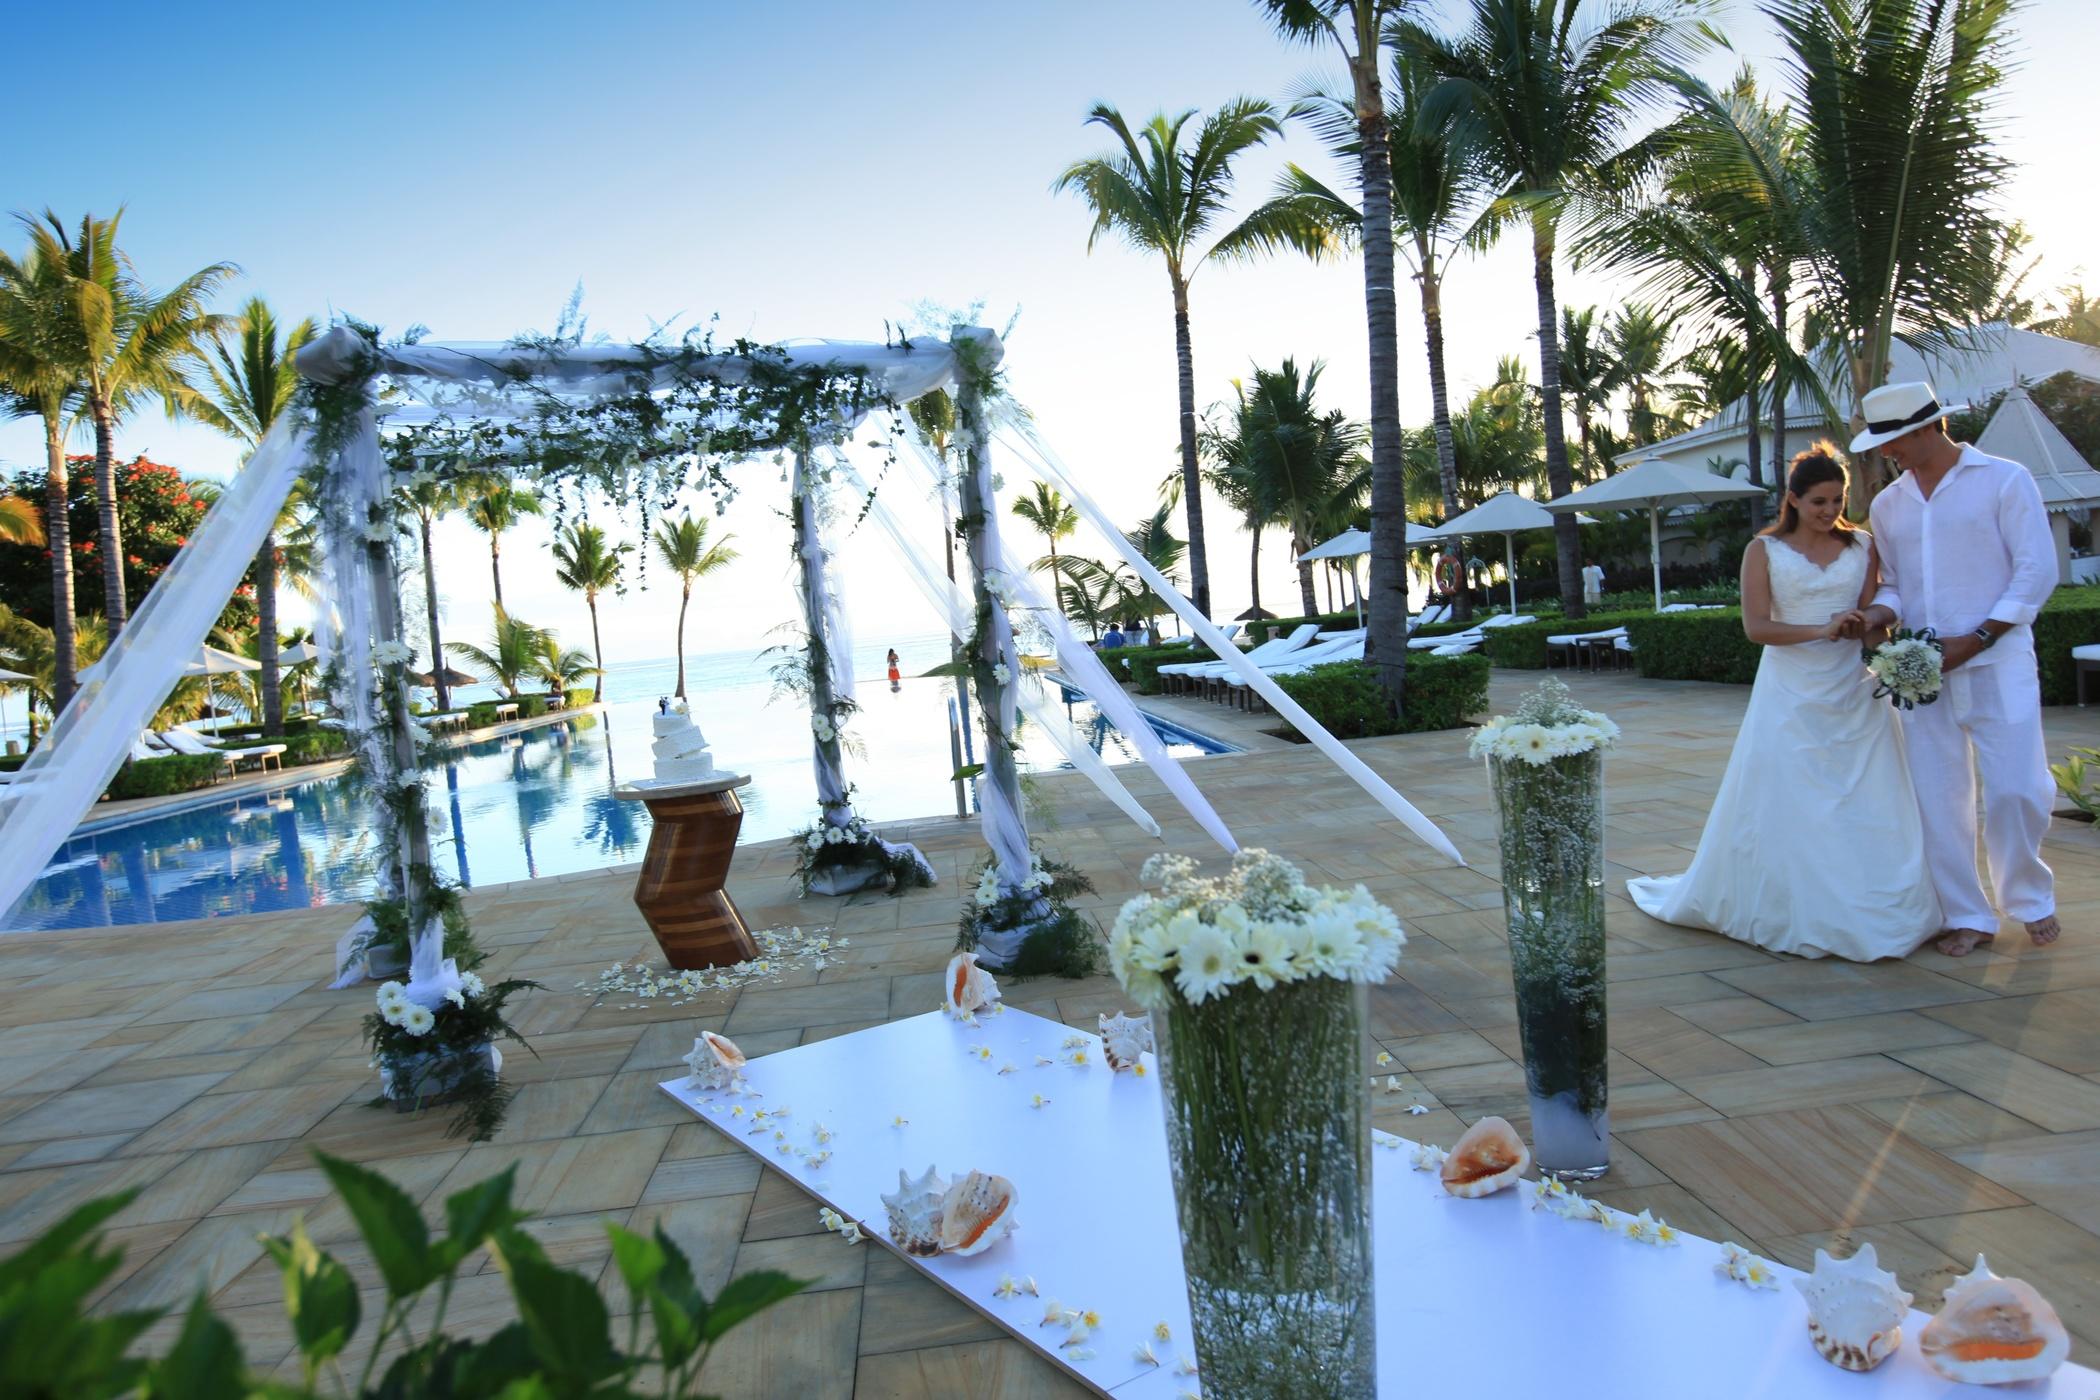 Wedding-setup-South-Pool-Sugar-Beach_2100x1400_300_RGB.jpg